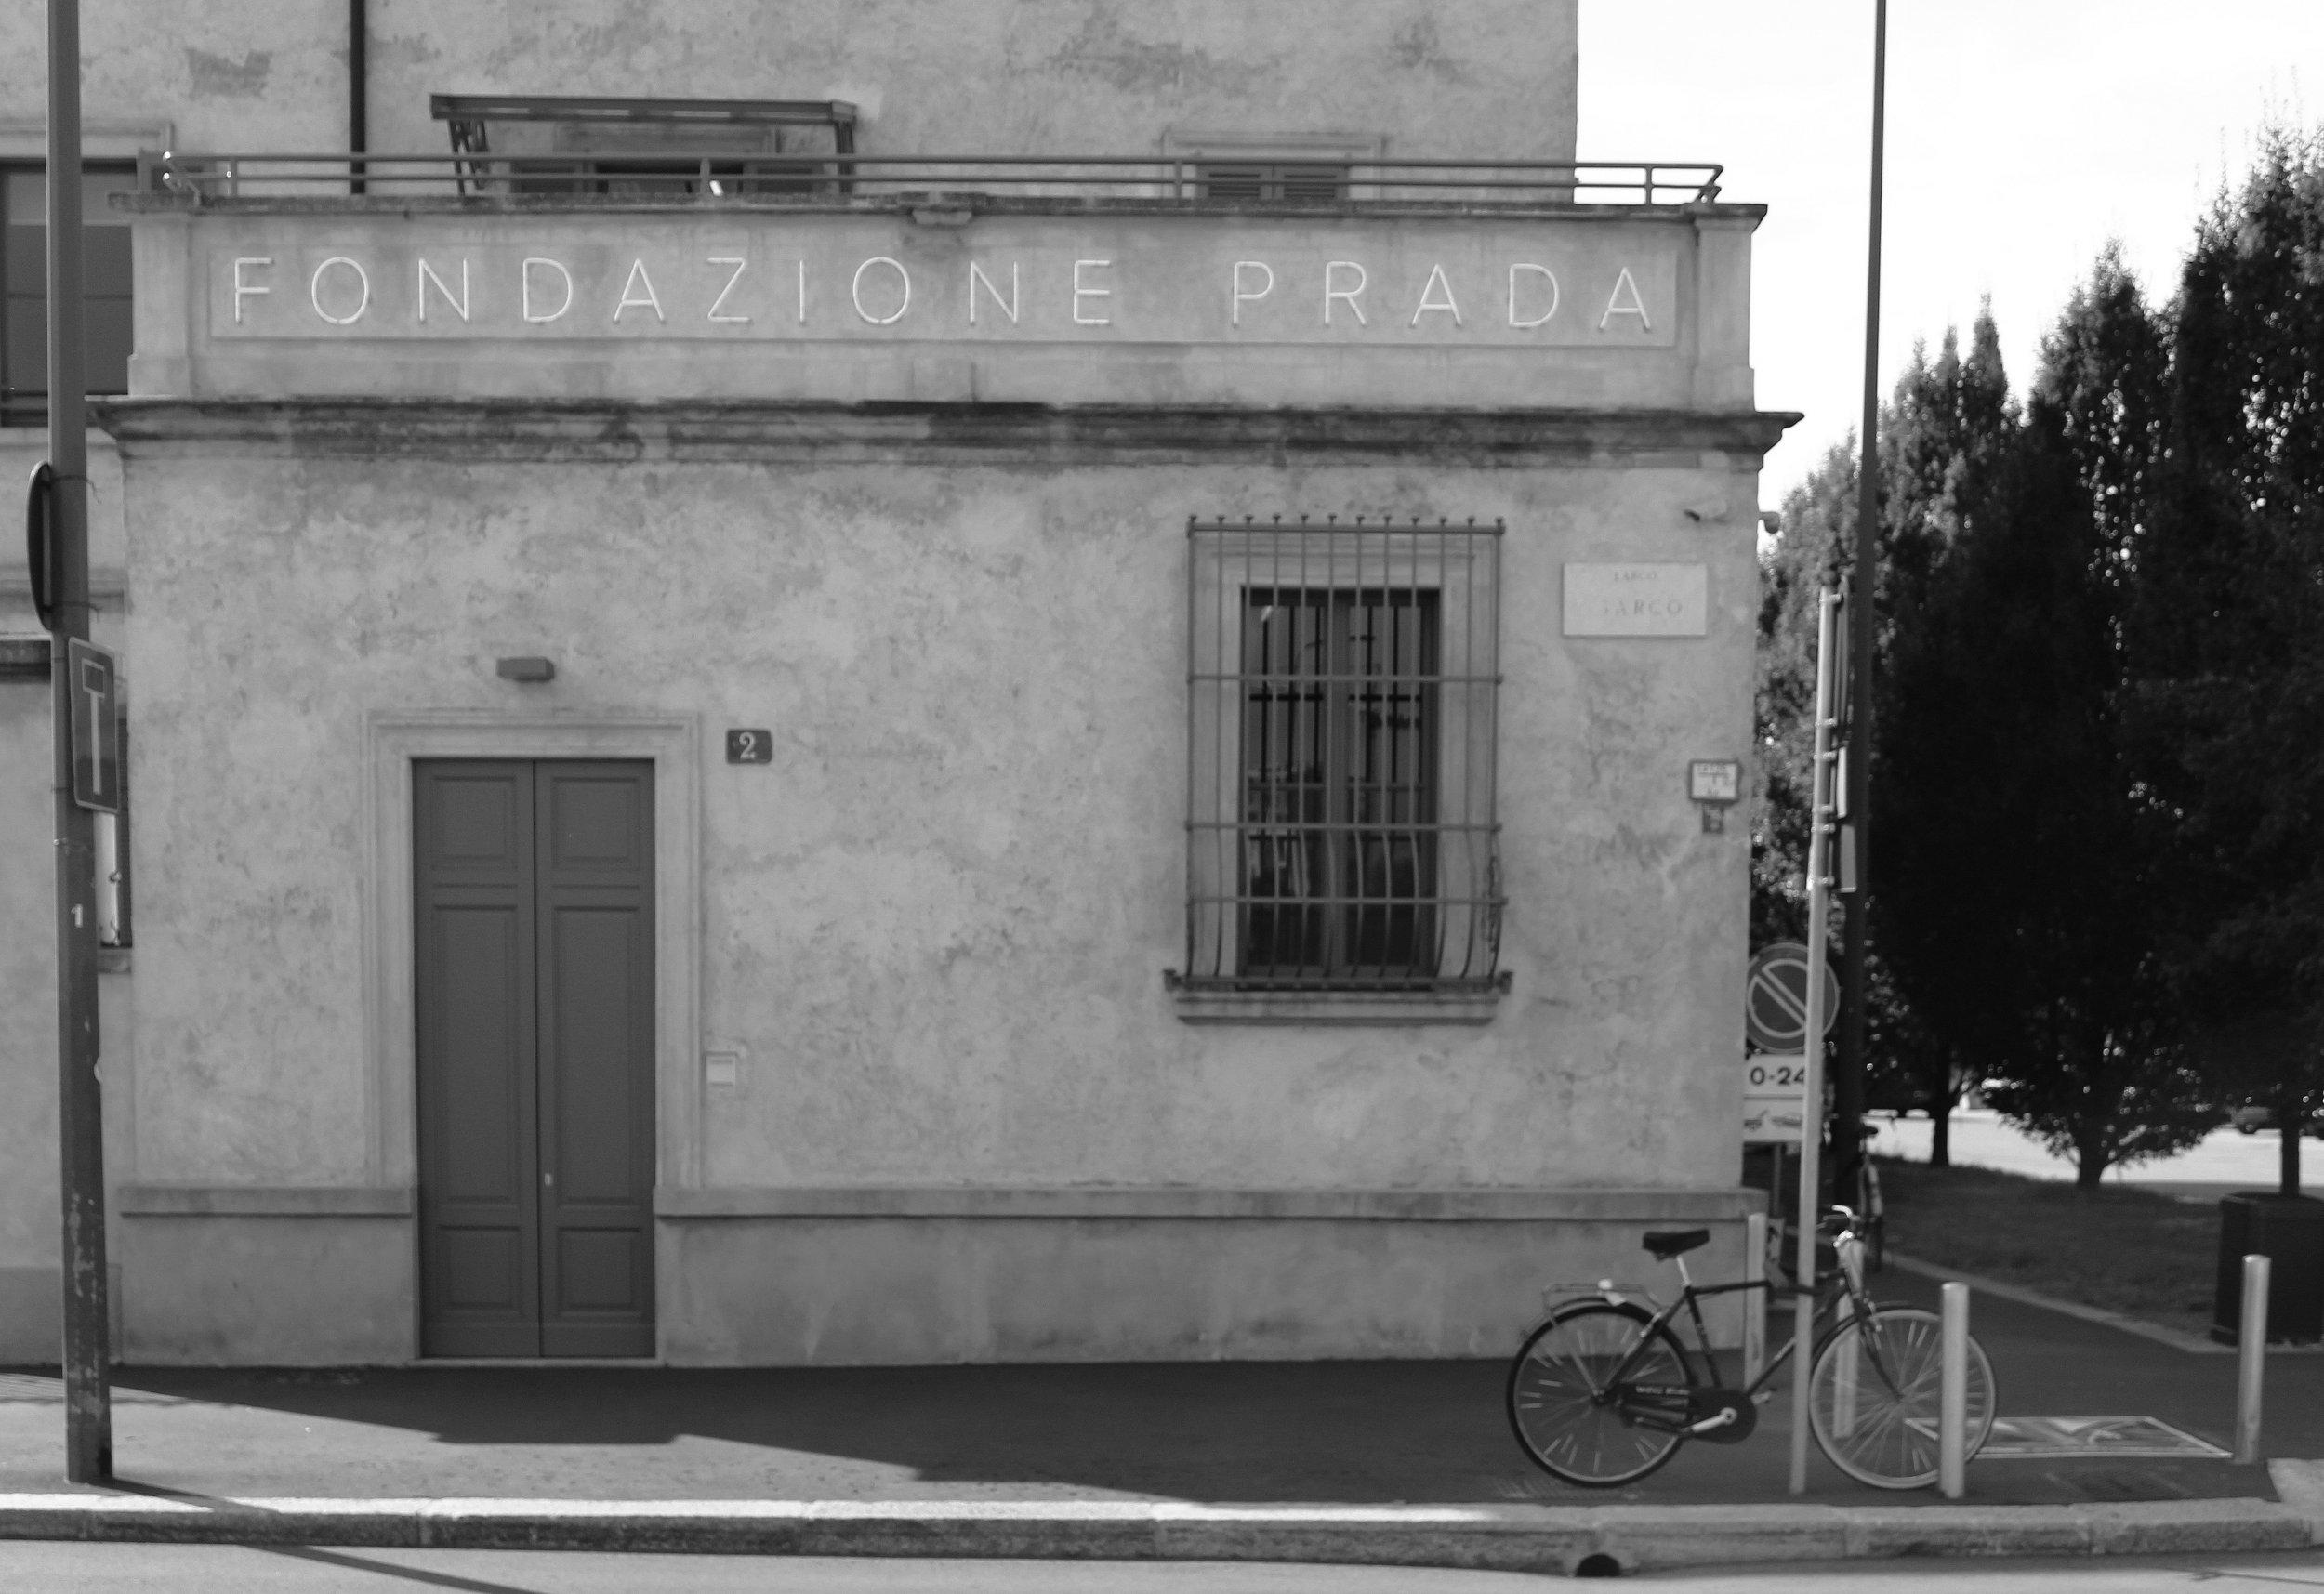 Milan: Sunday noon at Fondazione Prada